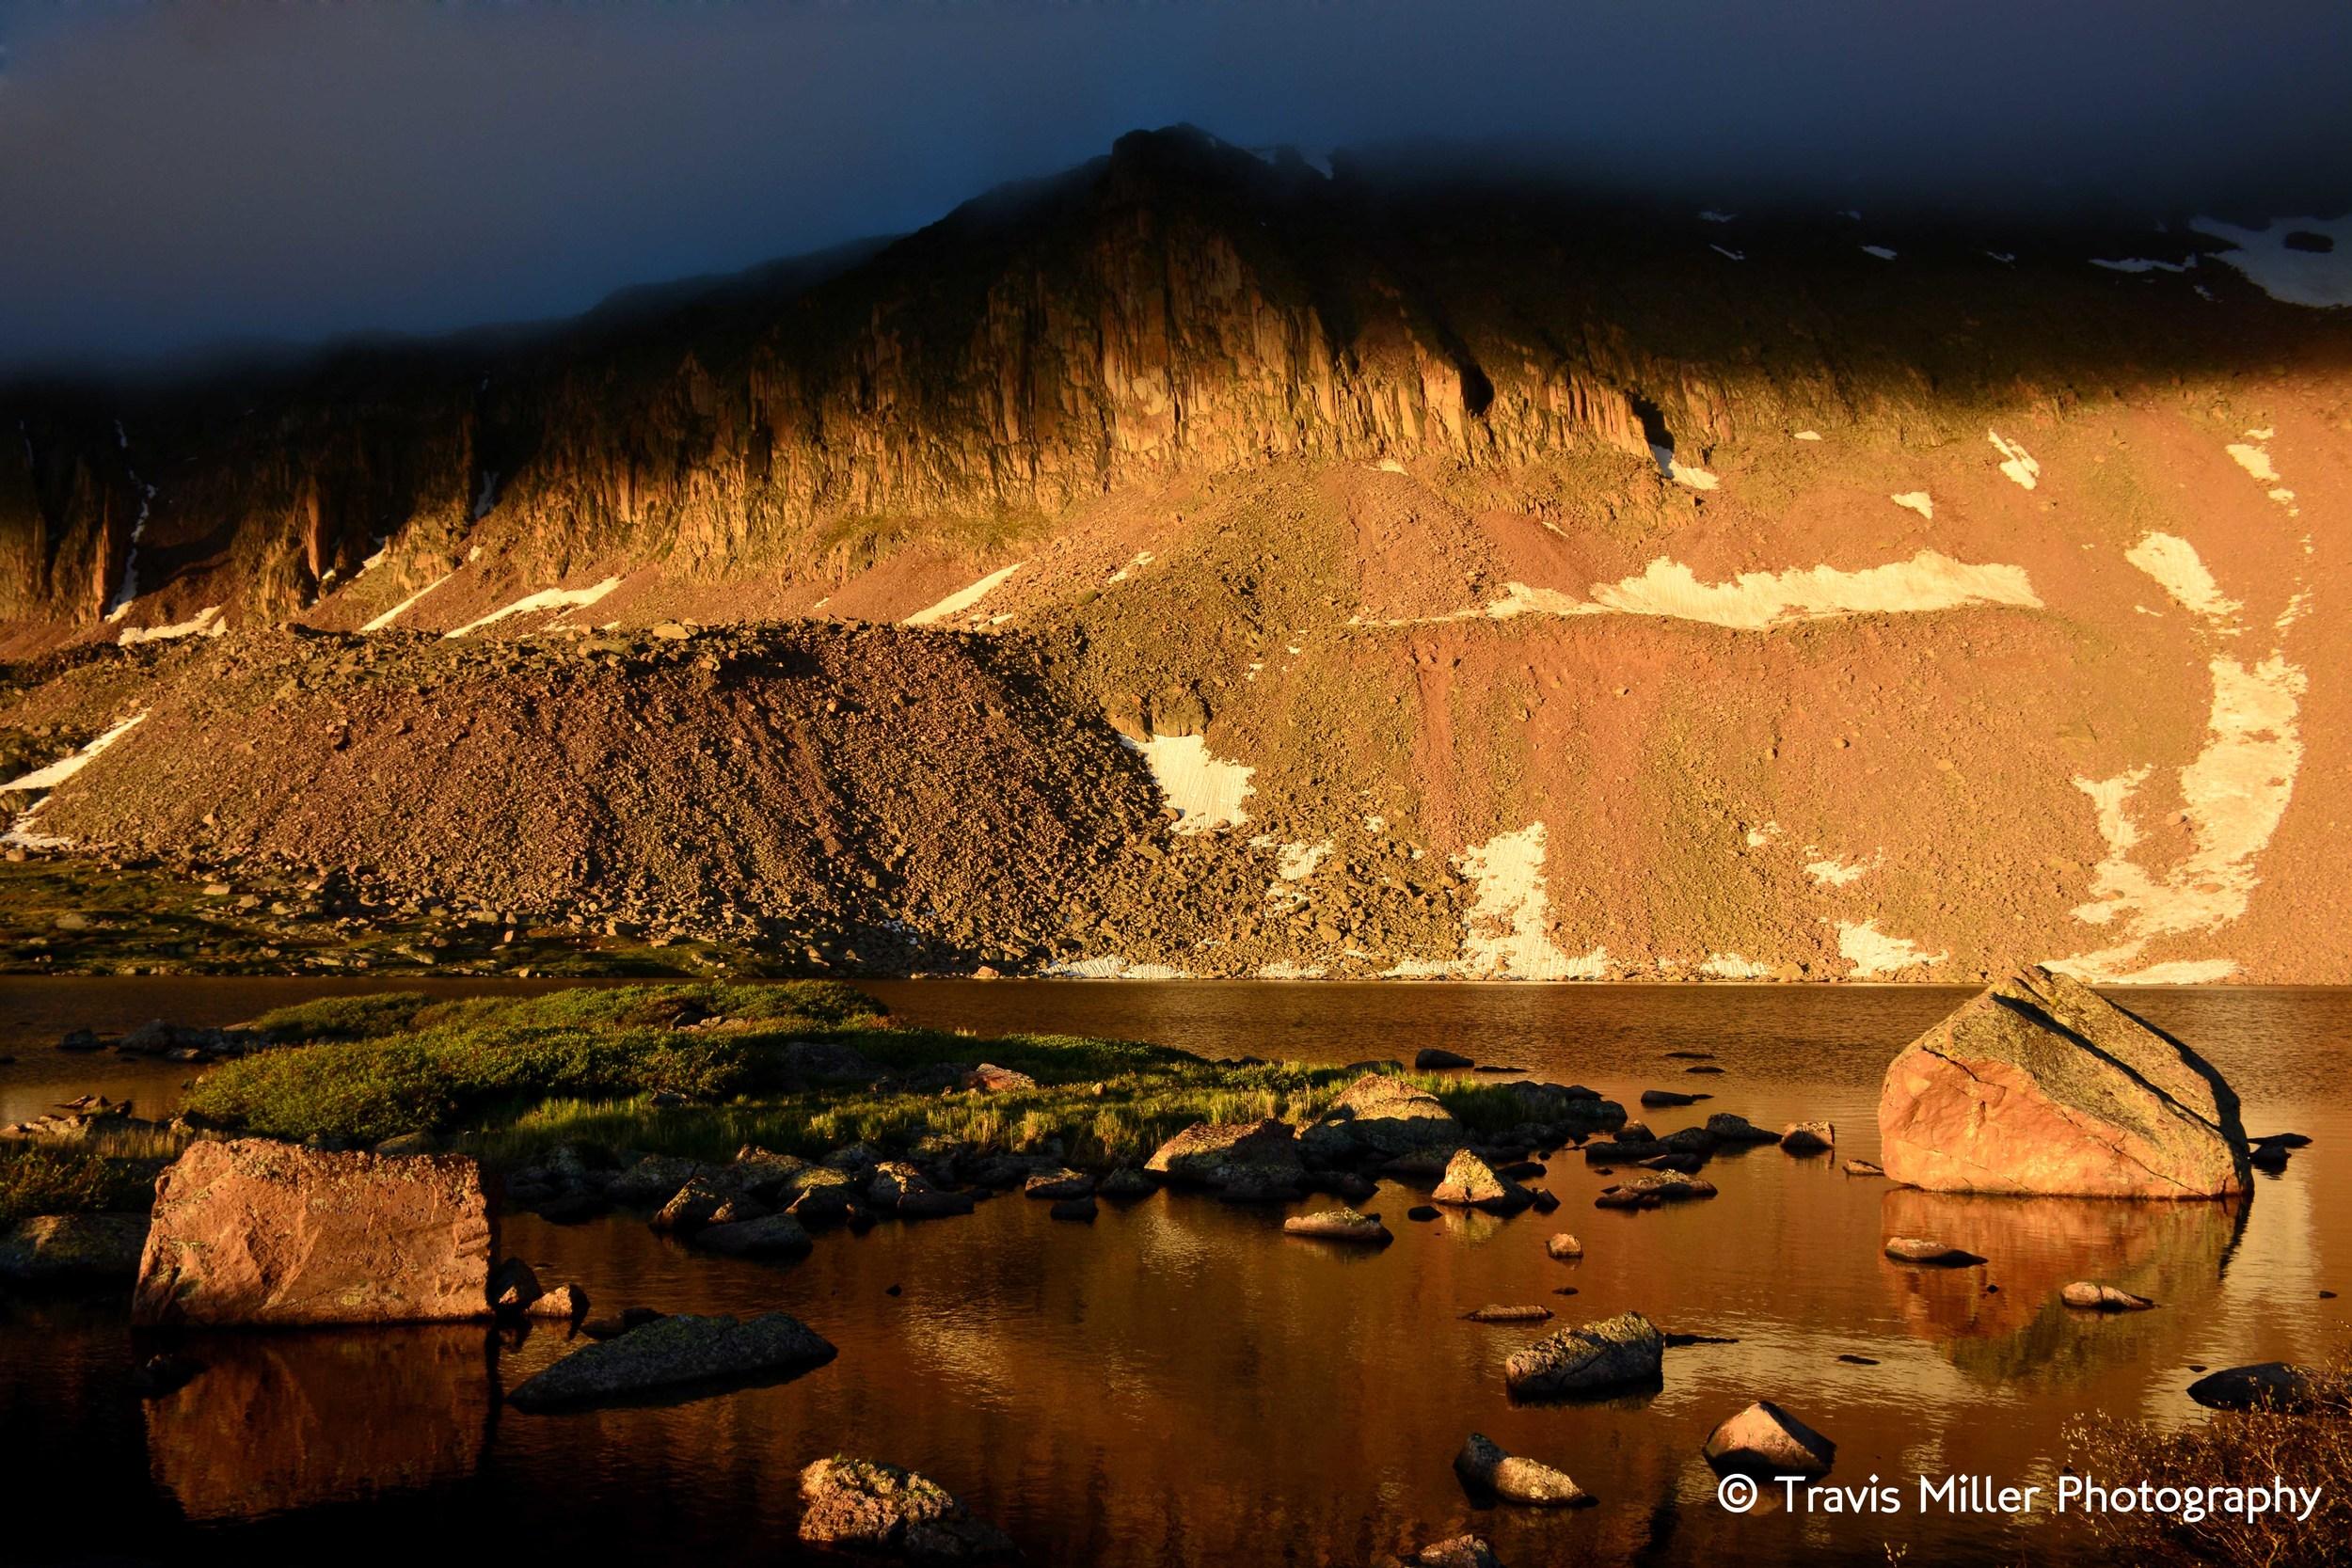 Machin Lake in the Early Morning /     La Garita Wilderness Area, CO